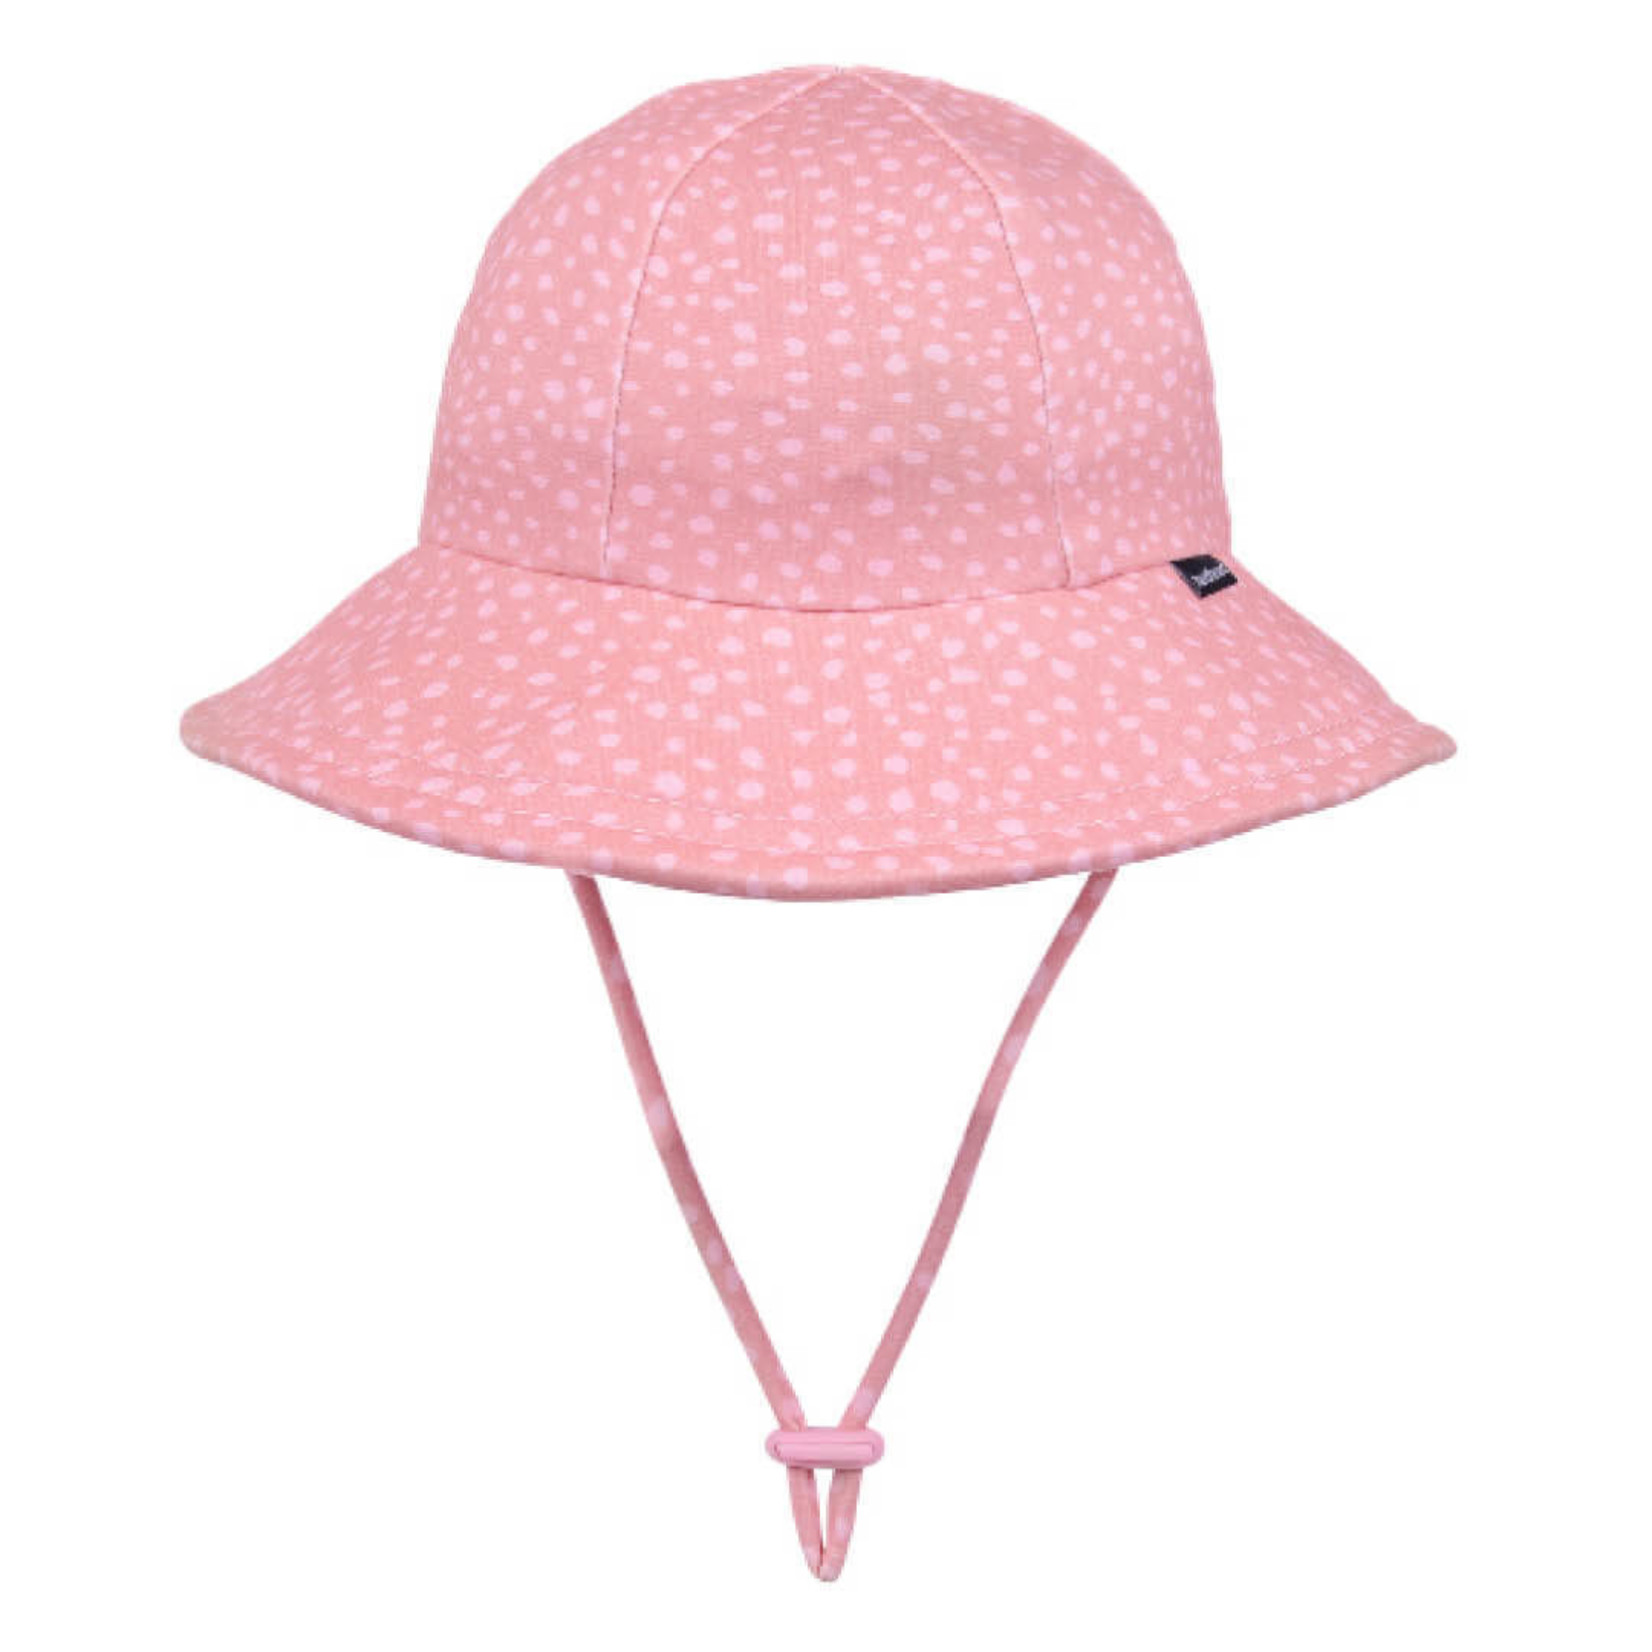 Bedhead Hats Bedhead Toddler Bucket Hat - Spot